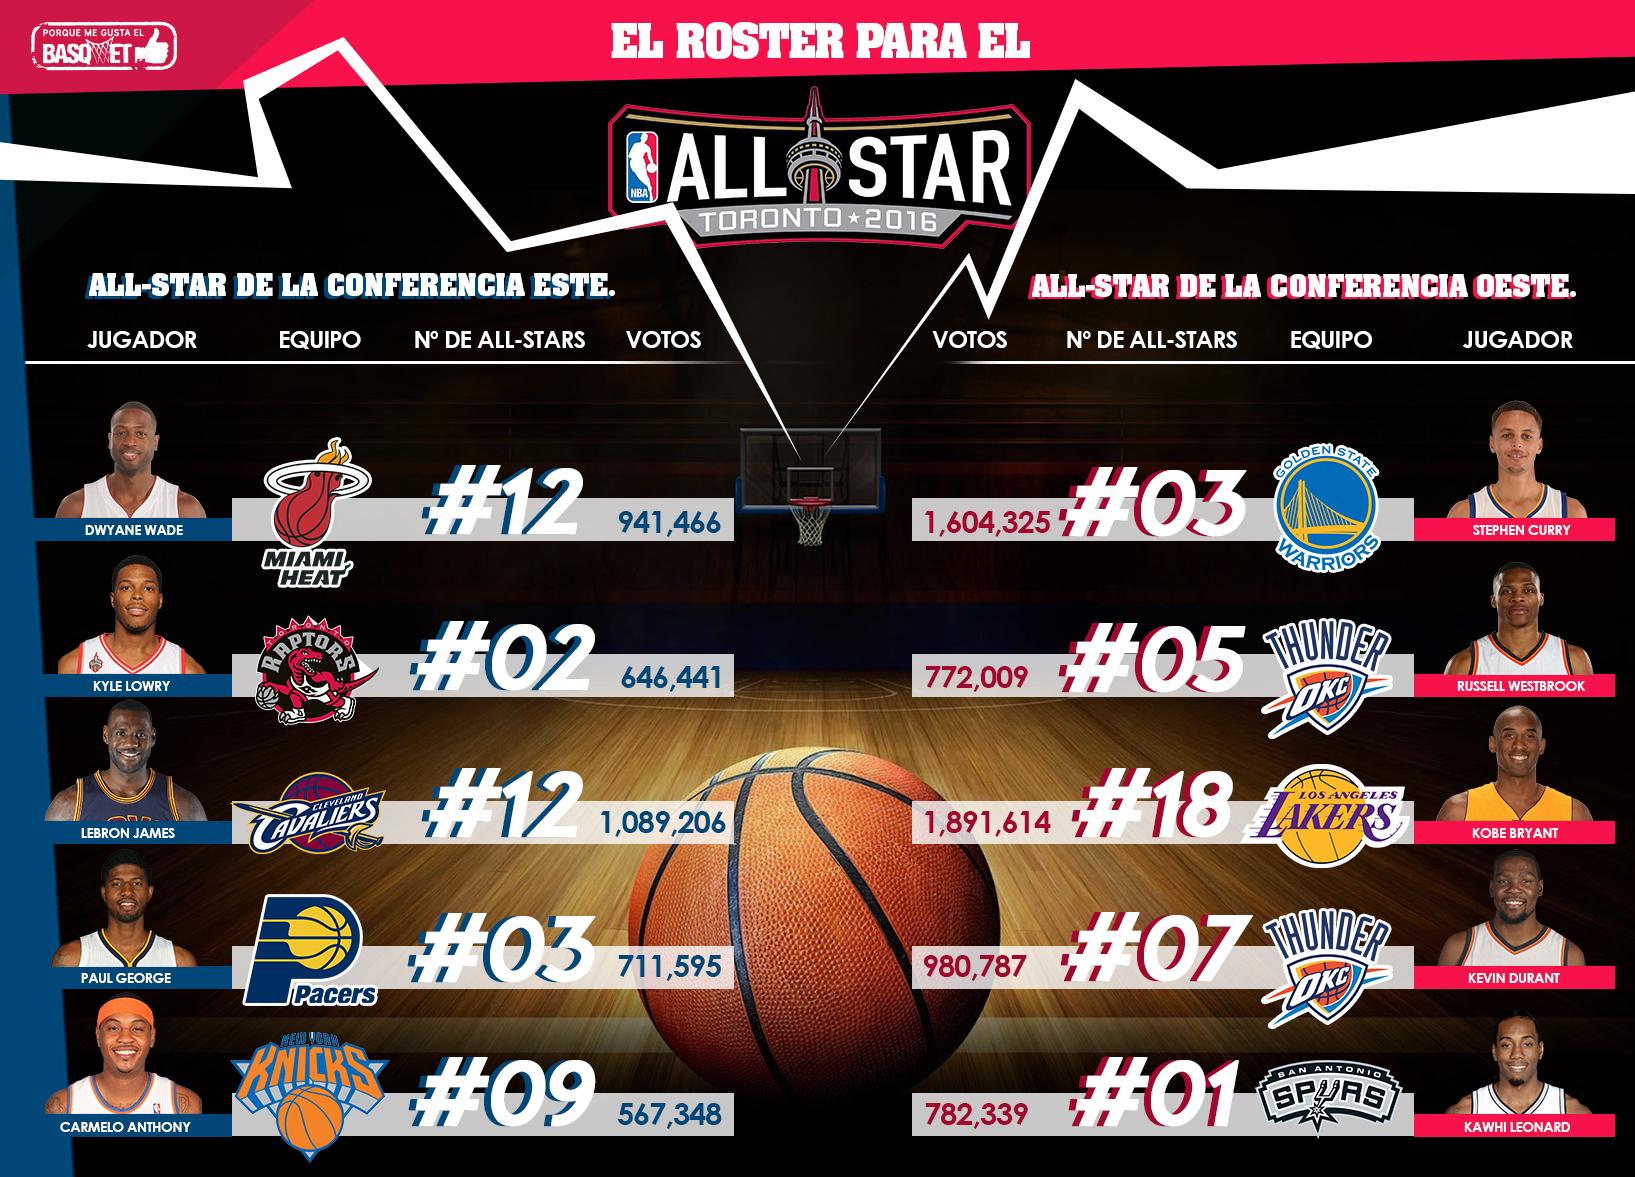 El roster del All-Star Game 2016 por Viva Basquet.